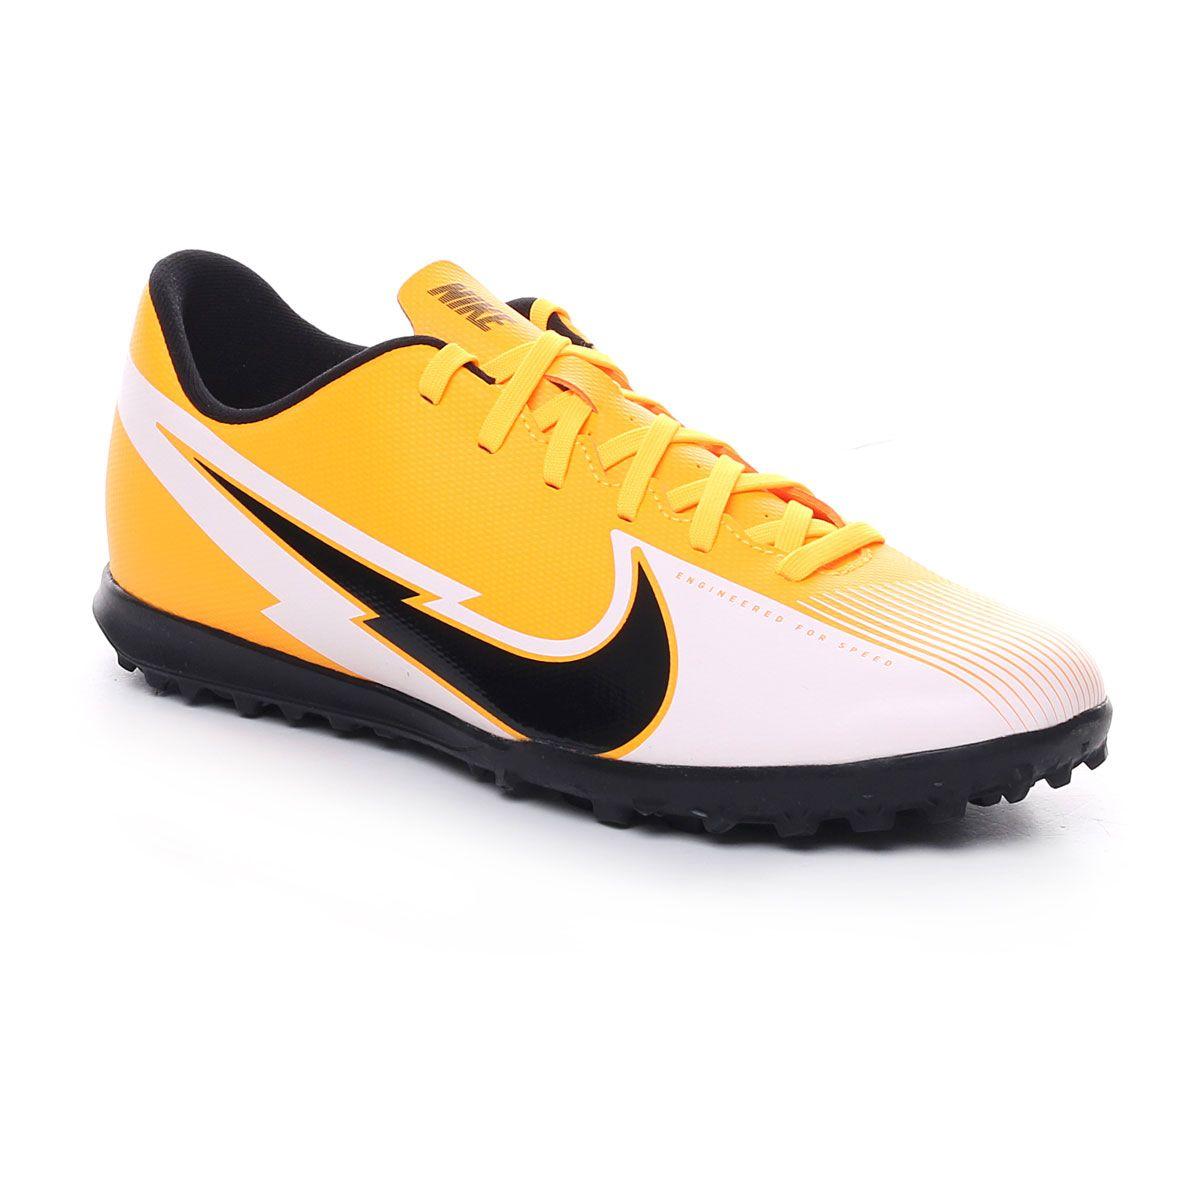 Nike Mercurial Vapor 13 Club Turf Daybreak Pack Uomo Arancione